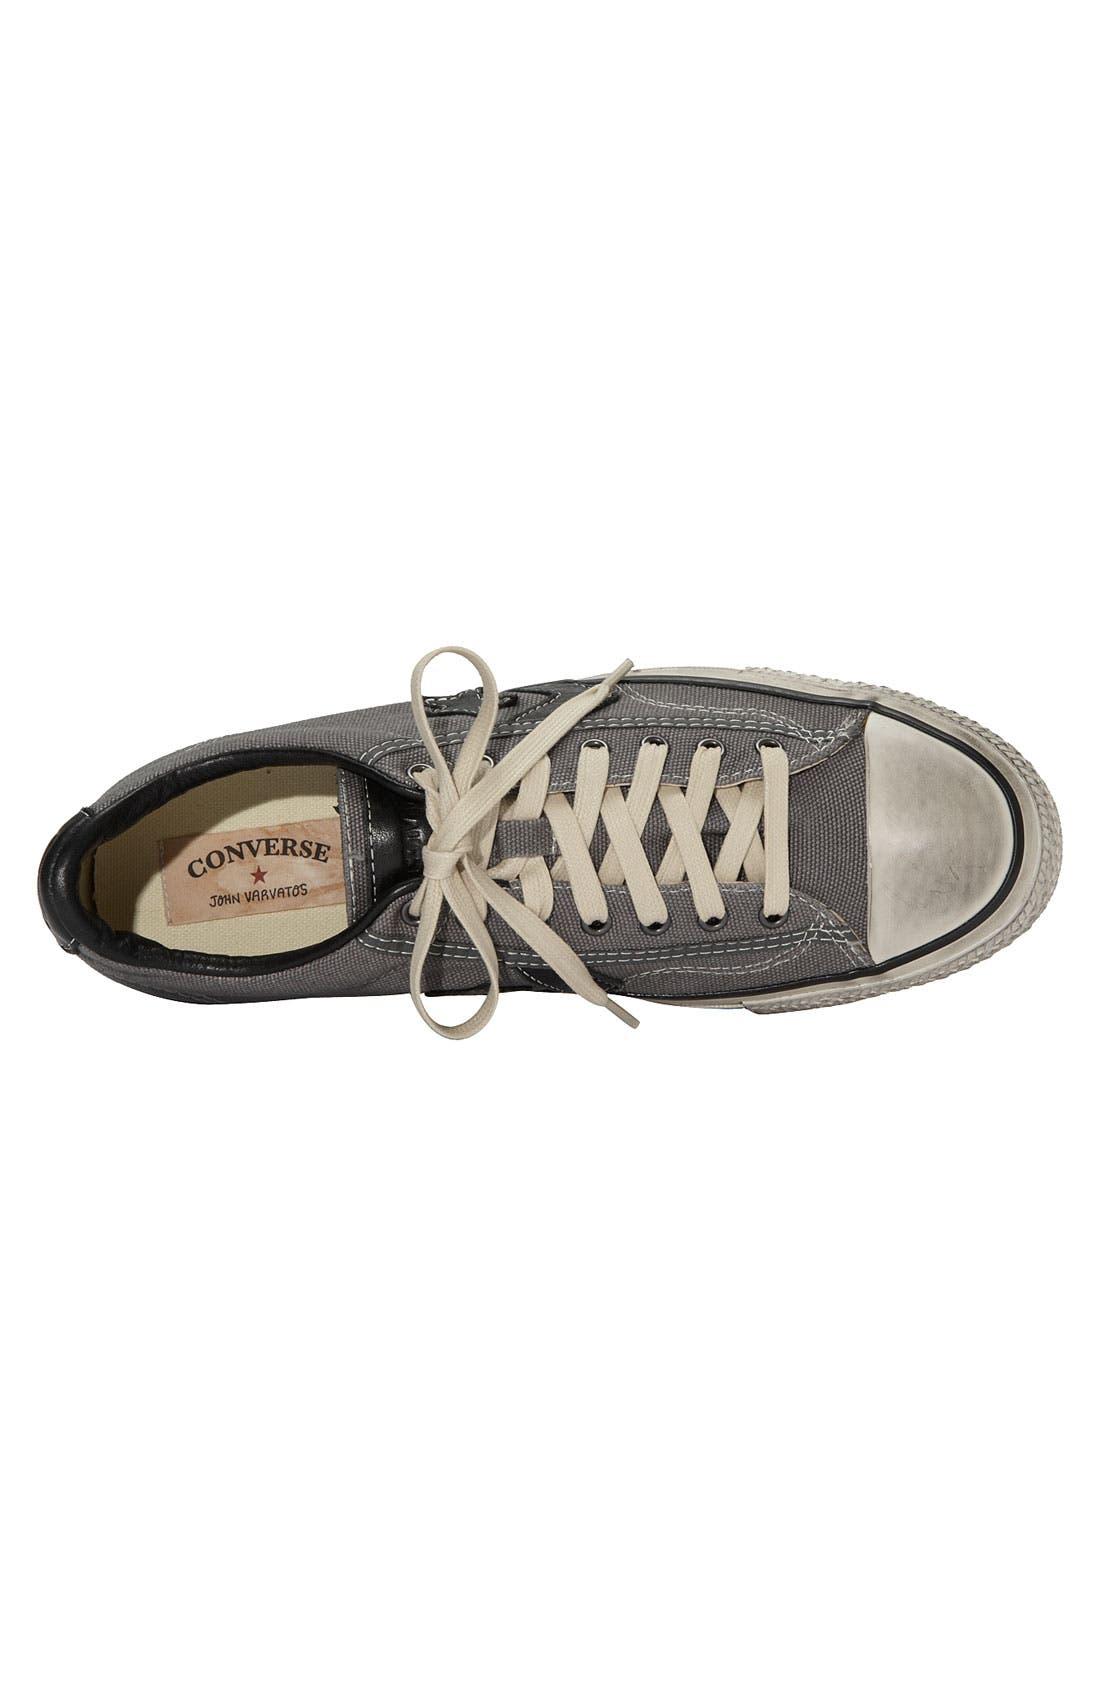 Alternate Image 3  - Converse by John Varvatos 'Star Player' Canvas Sneaker (Men)